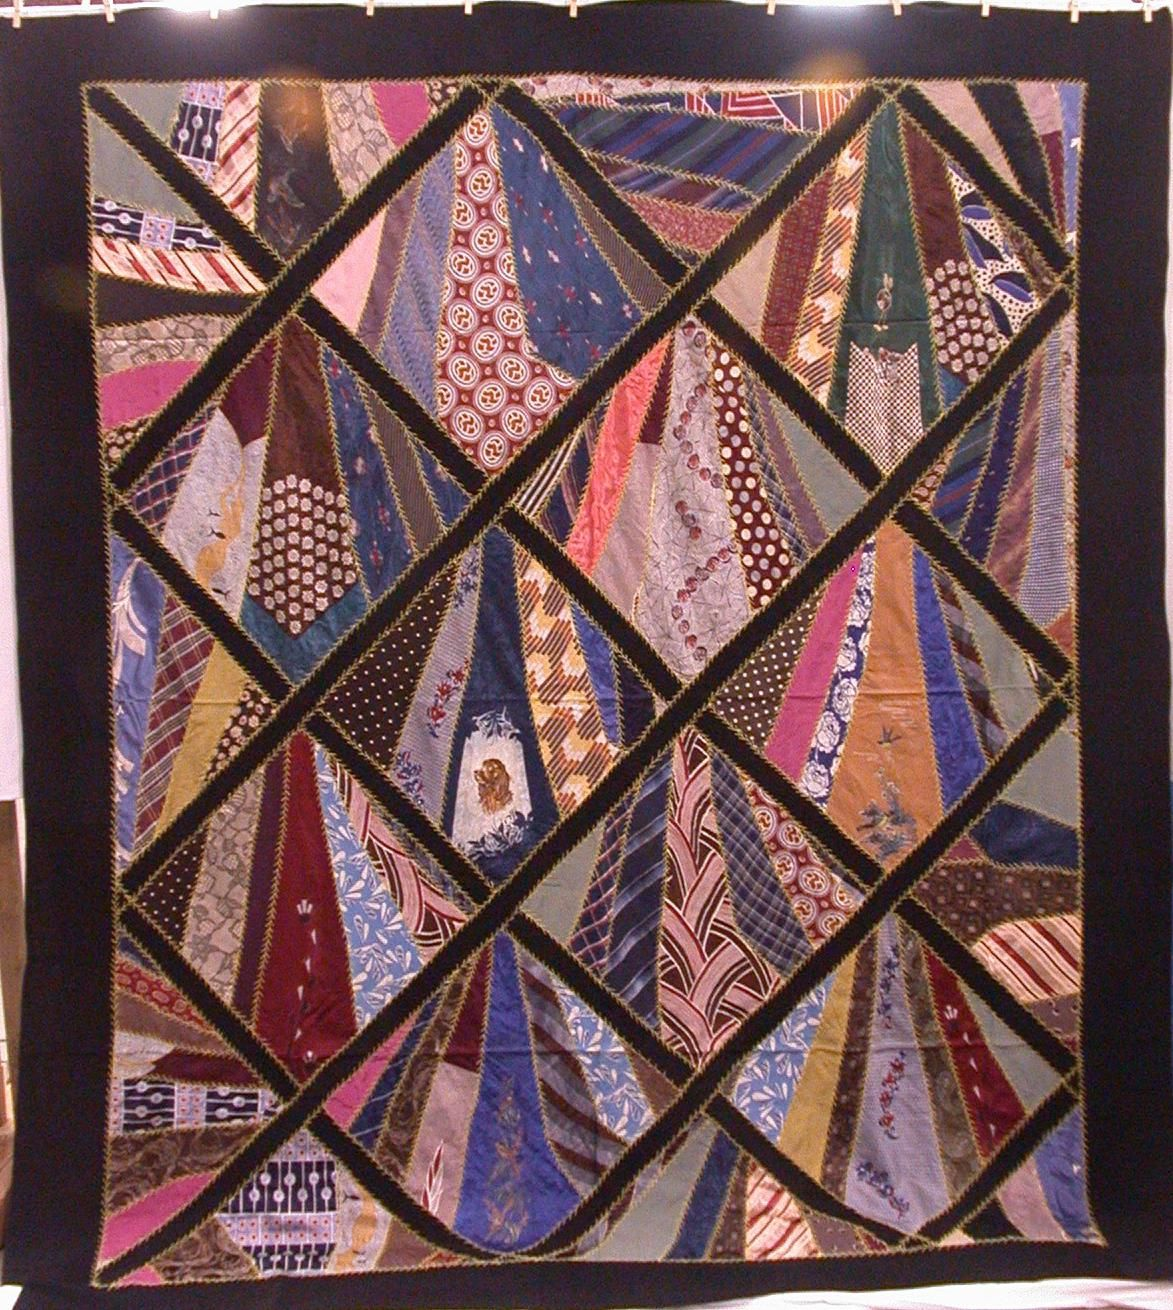 Tie quilts patterns men s tie quilt this quilt was hand made with tie quilts patterns men s tie quilt this quilt was hand made with some machine ccuart Image collections